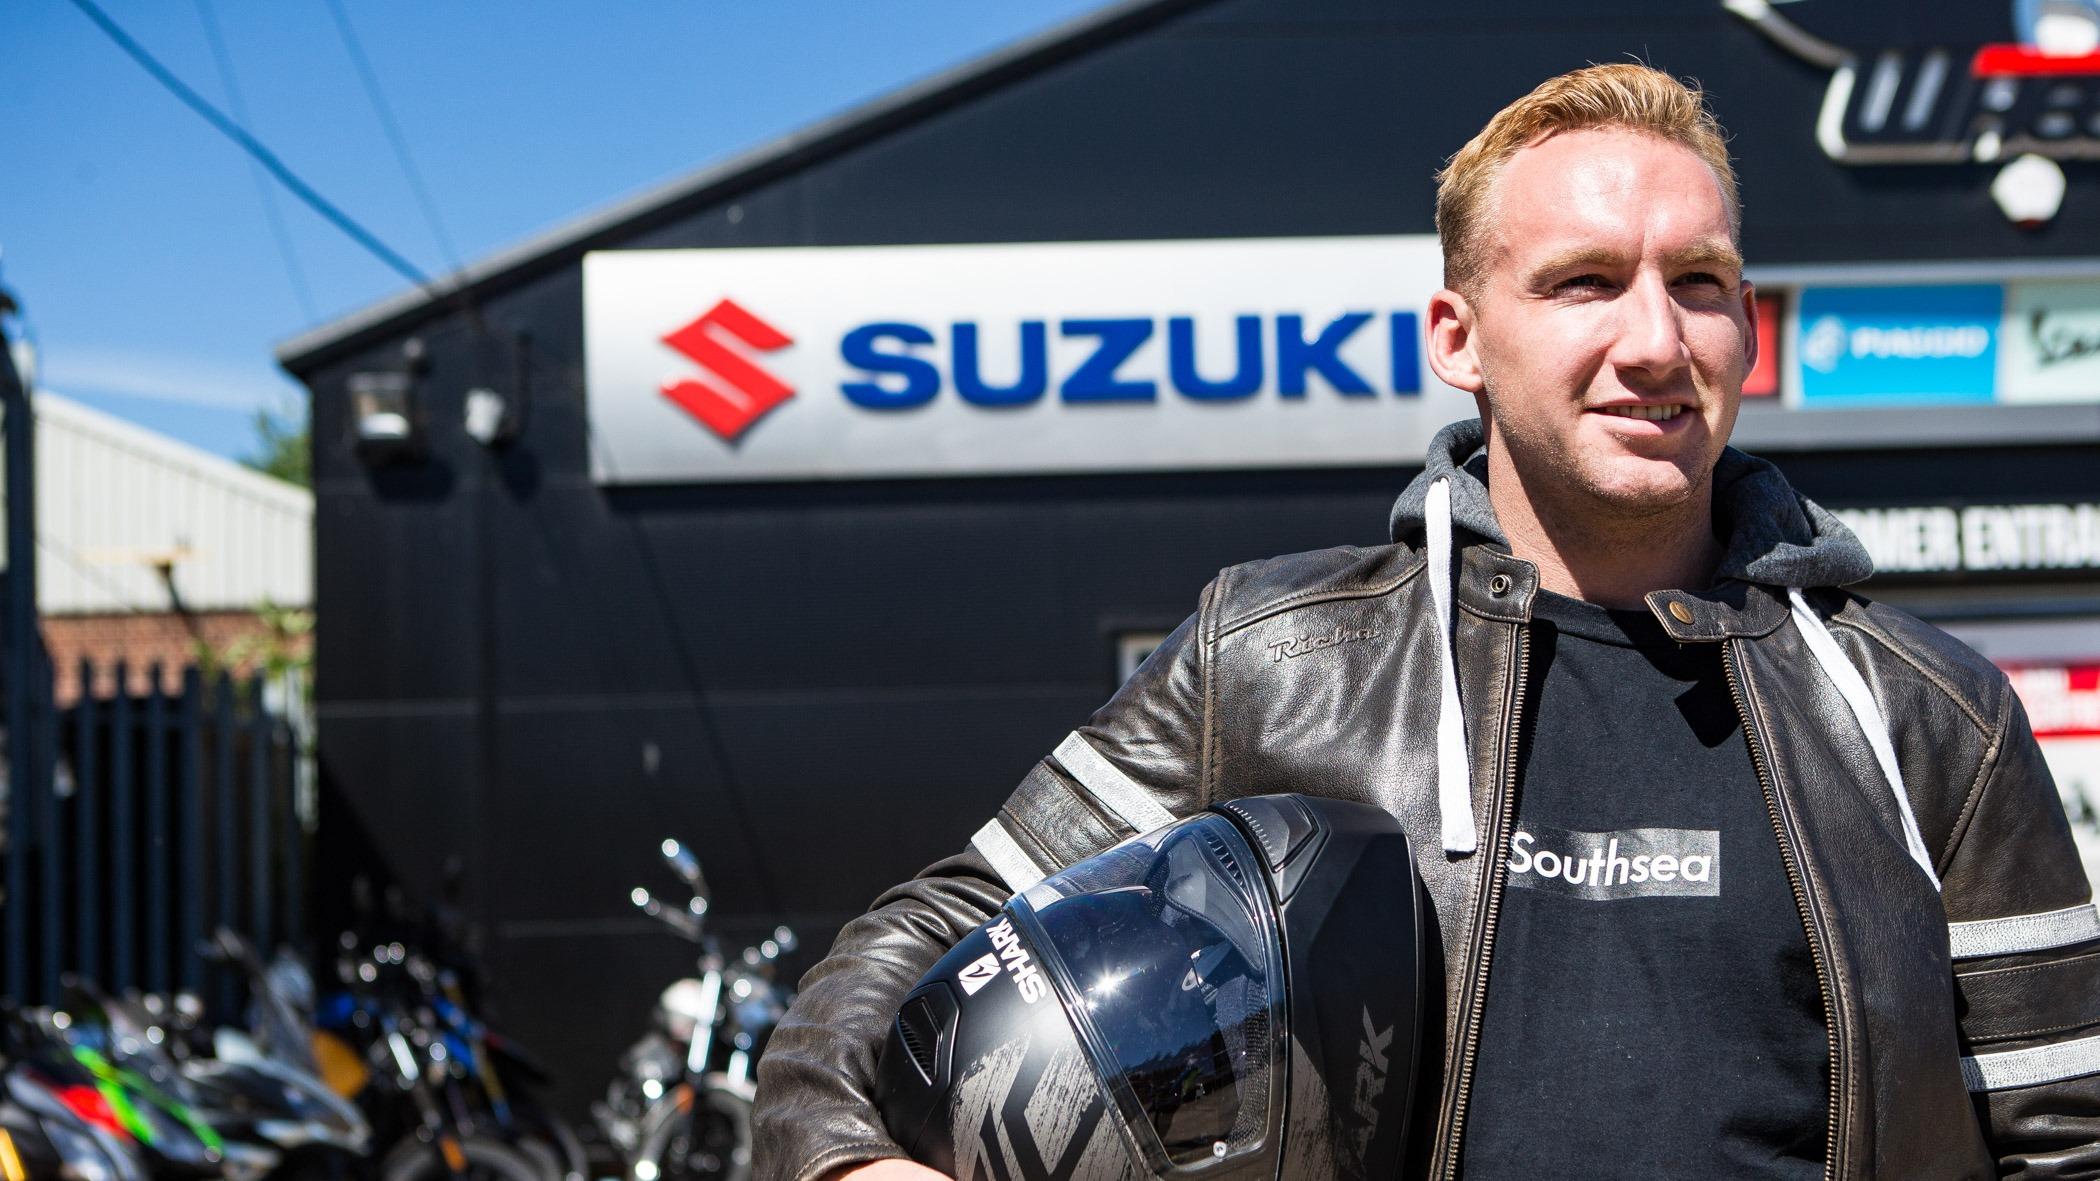 Declan Brooks on Suzuki Motorcycles and Team GB | Ri